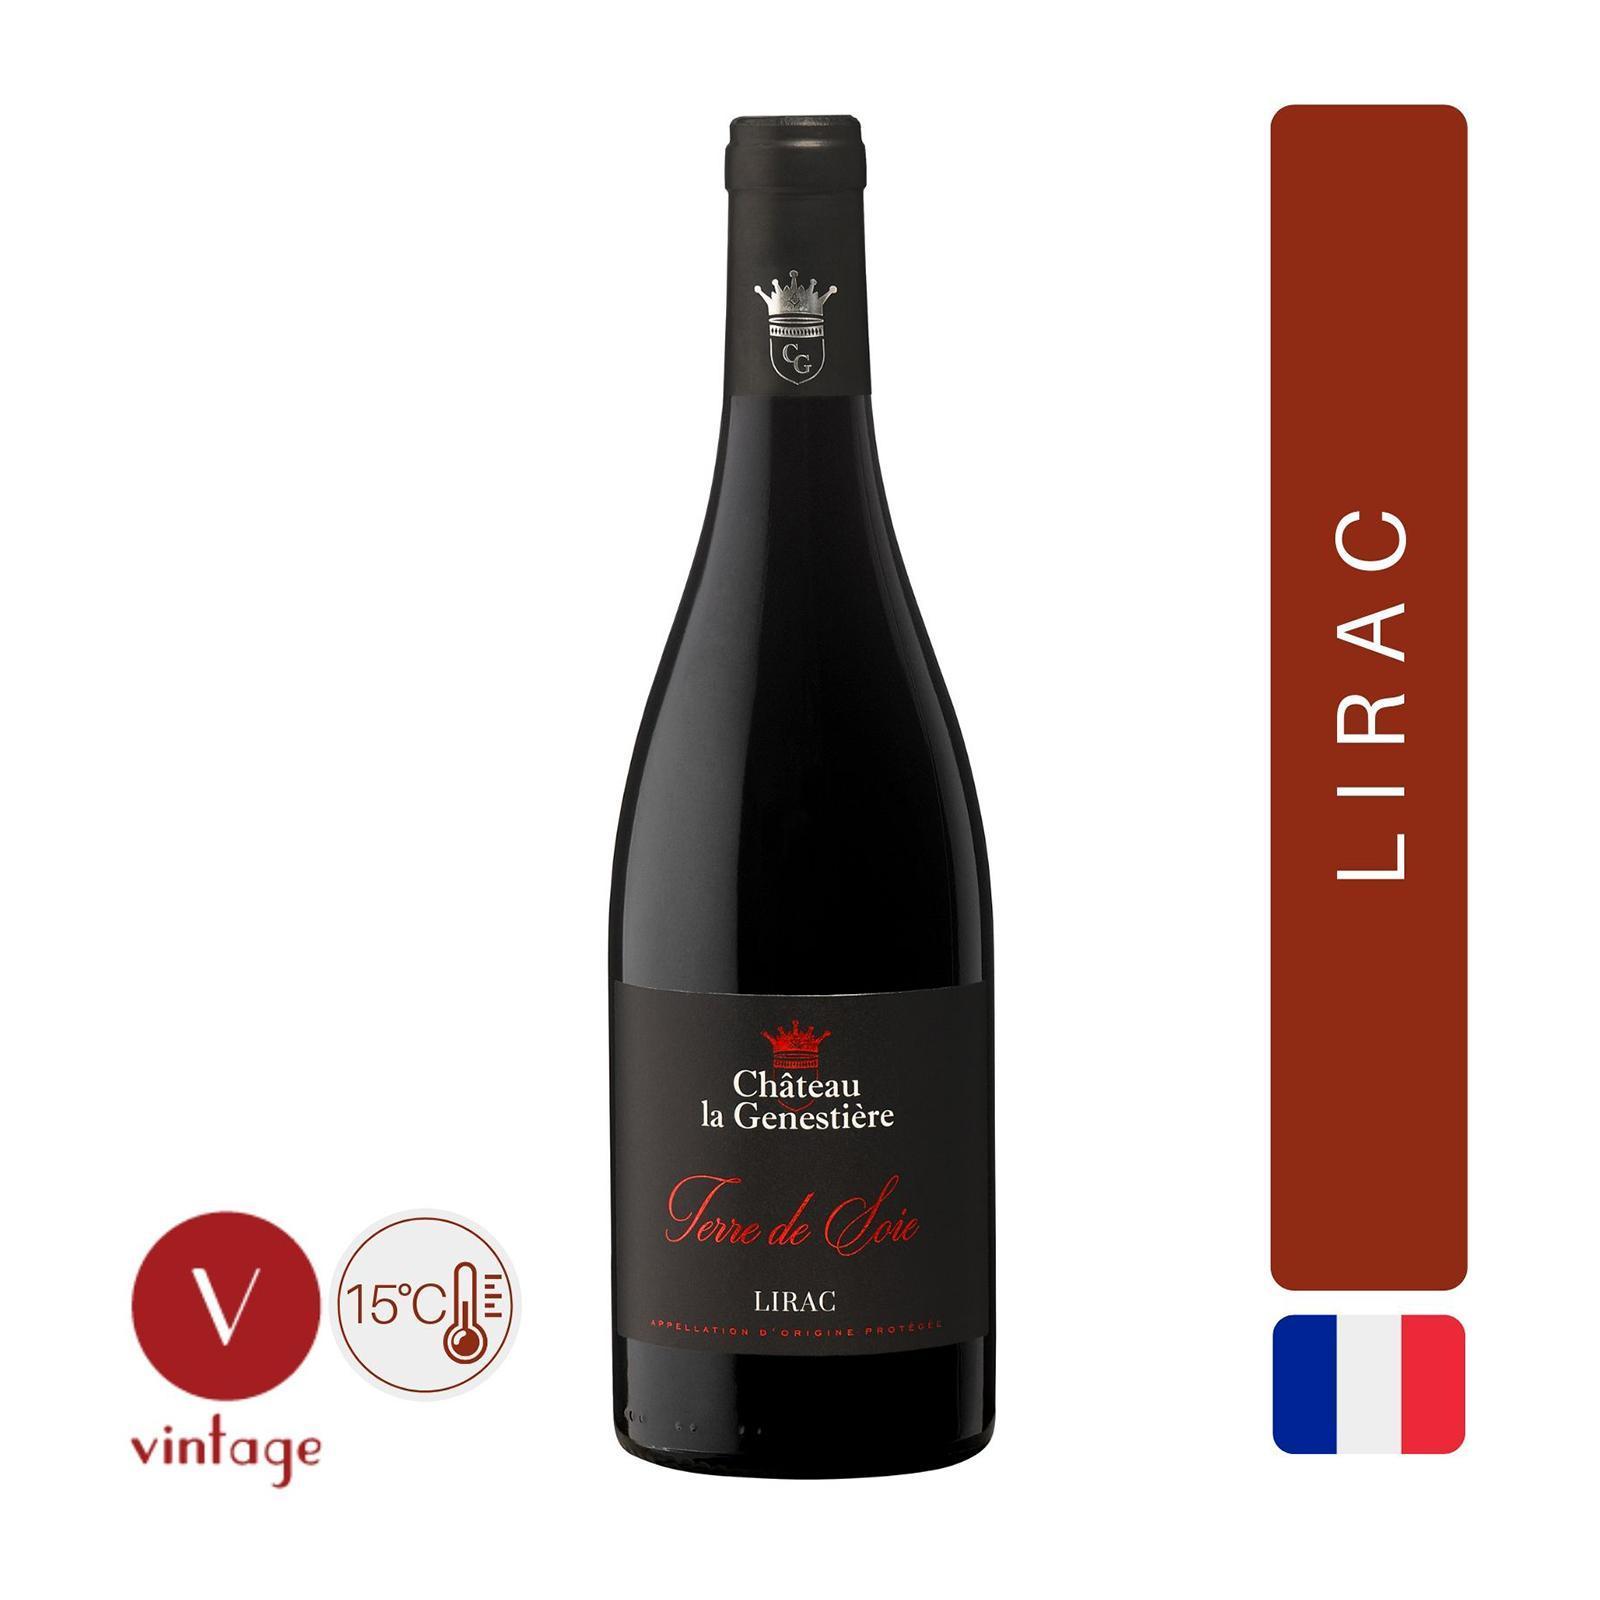 Chateau la Genestiere - Terre de Soie - Red Wine - By The Vintage Wine Club